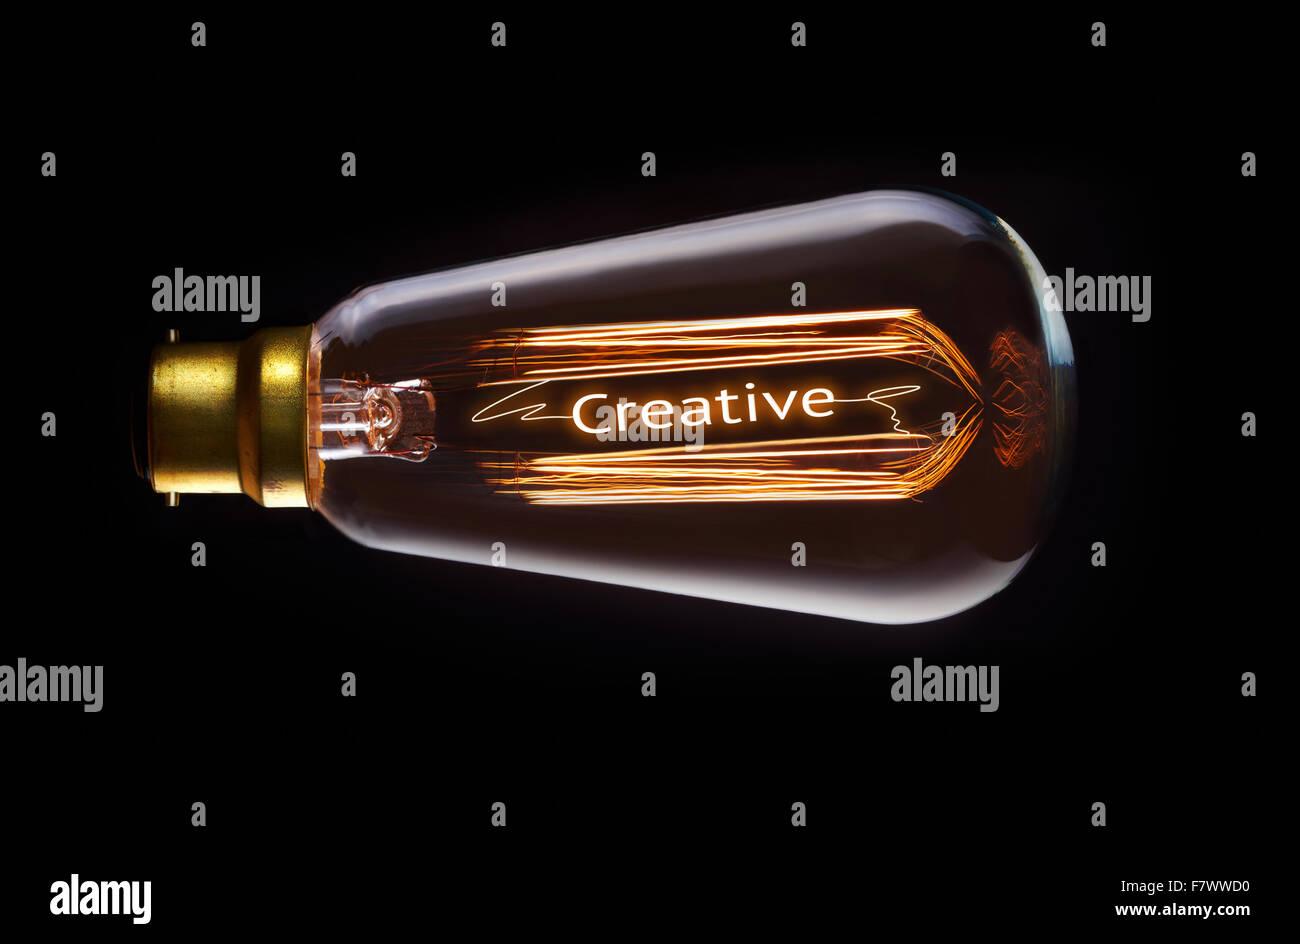 Creative concept in a filament lightbulb. Stock Photo